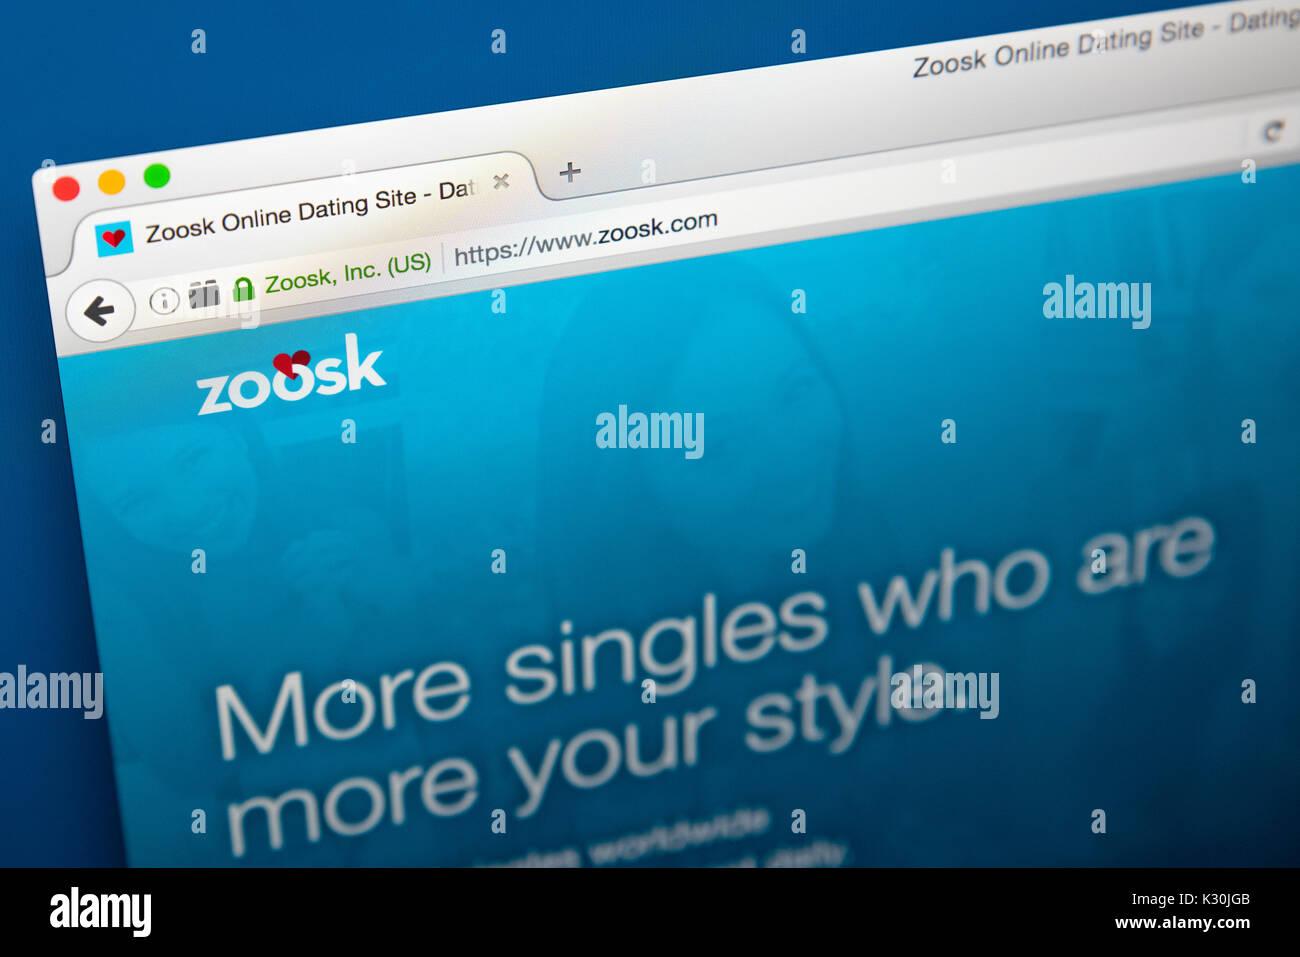 zoosk dating uk